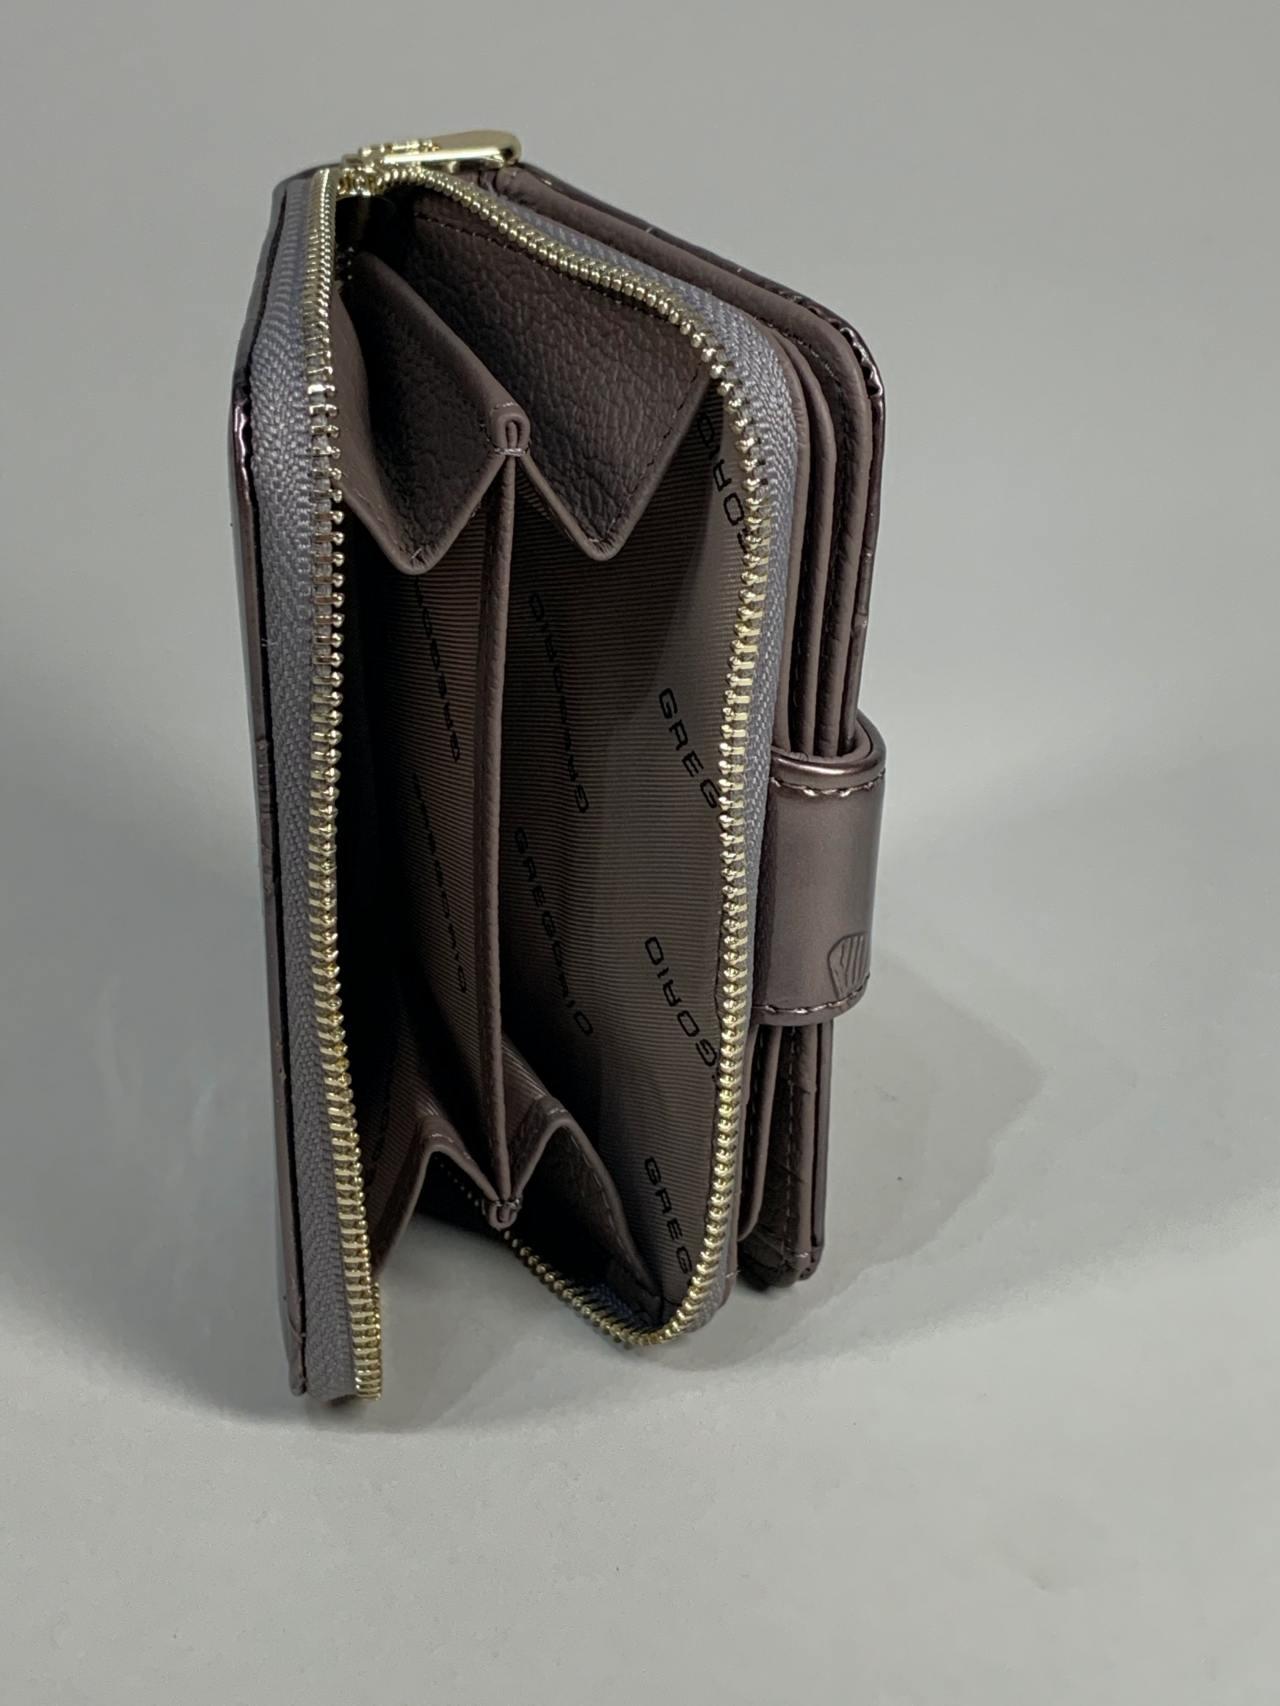 Kožená peněženka Gregorio S šedá s motýly -06